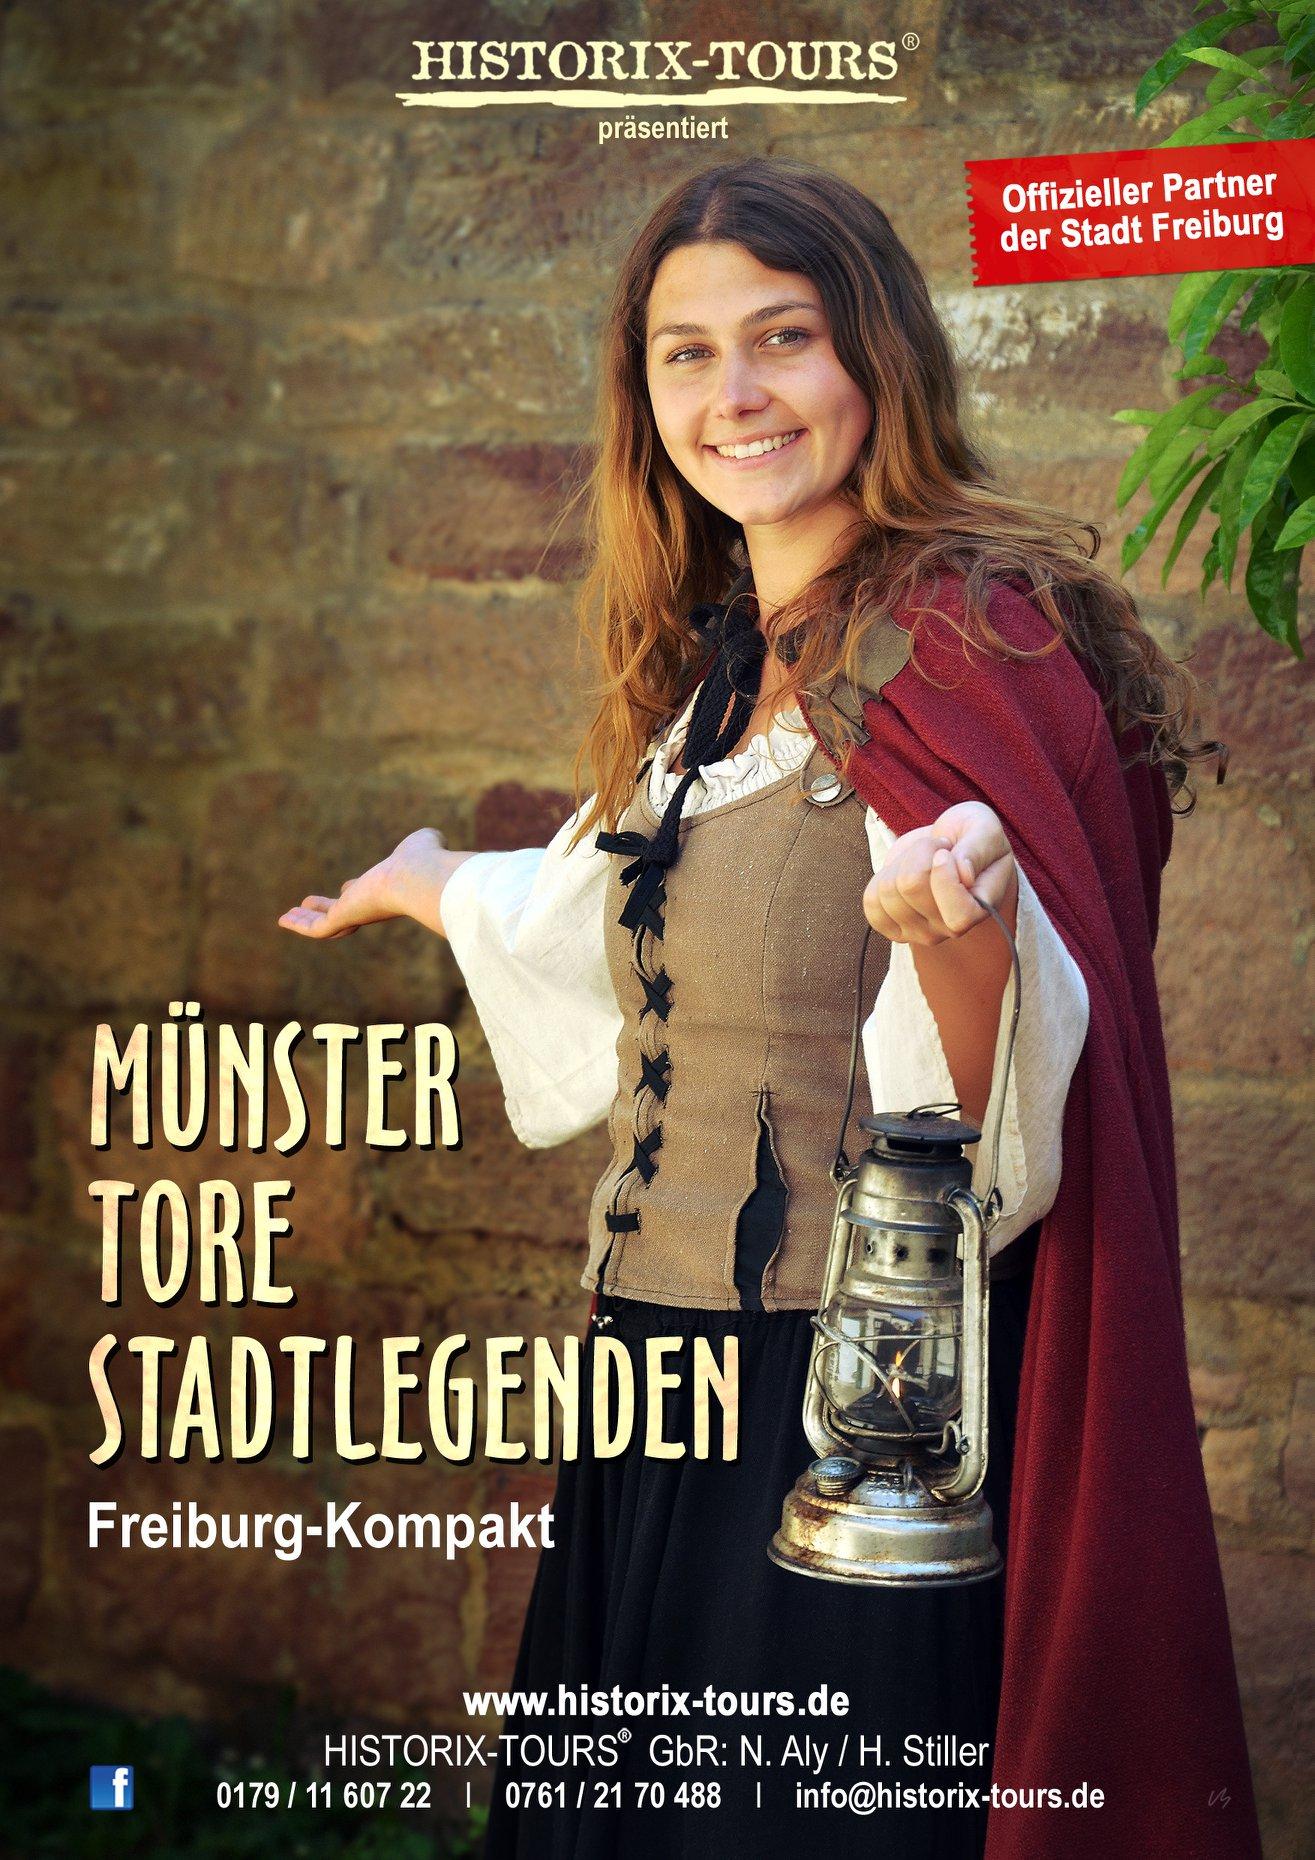 Münster, Tore, Stadtlegenden – Freiburg kompakt